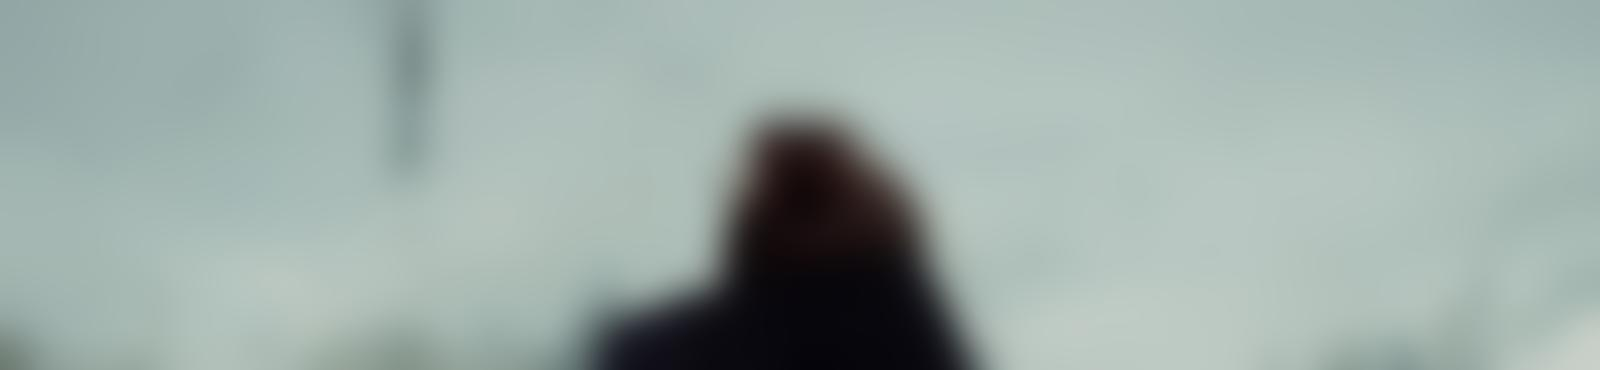 Blurred 6efdaf0c d4f9 4872 979b 7441916ccbda